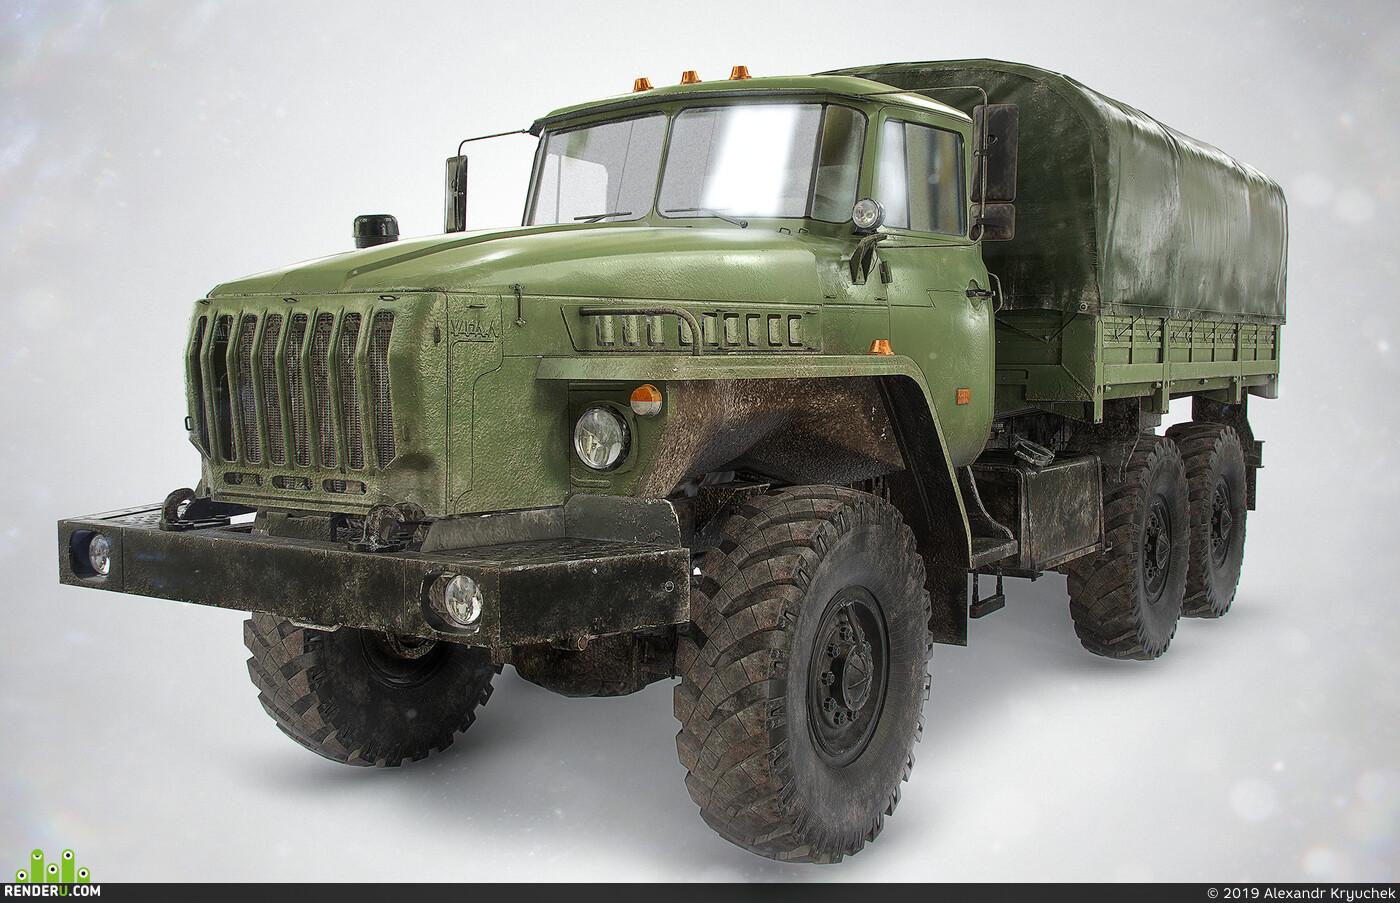 Vehicles, vehicle, Soviet, Soviet Union, offroad, military